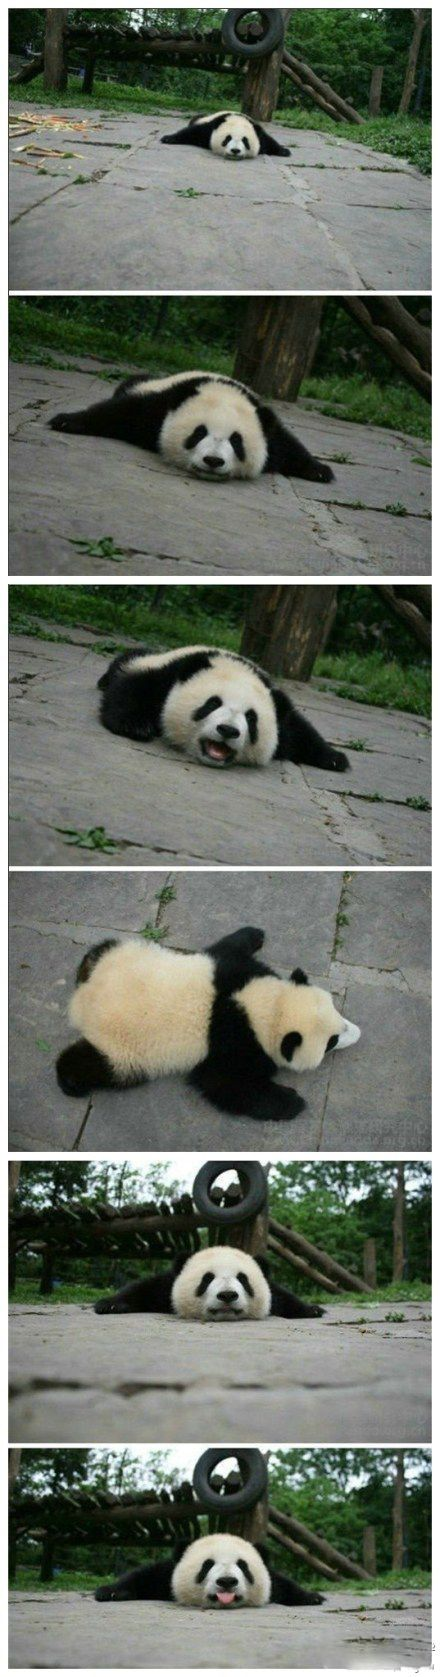 I want to be a panda  #Panda                                                                                                                                                                                 More